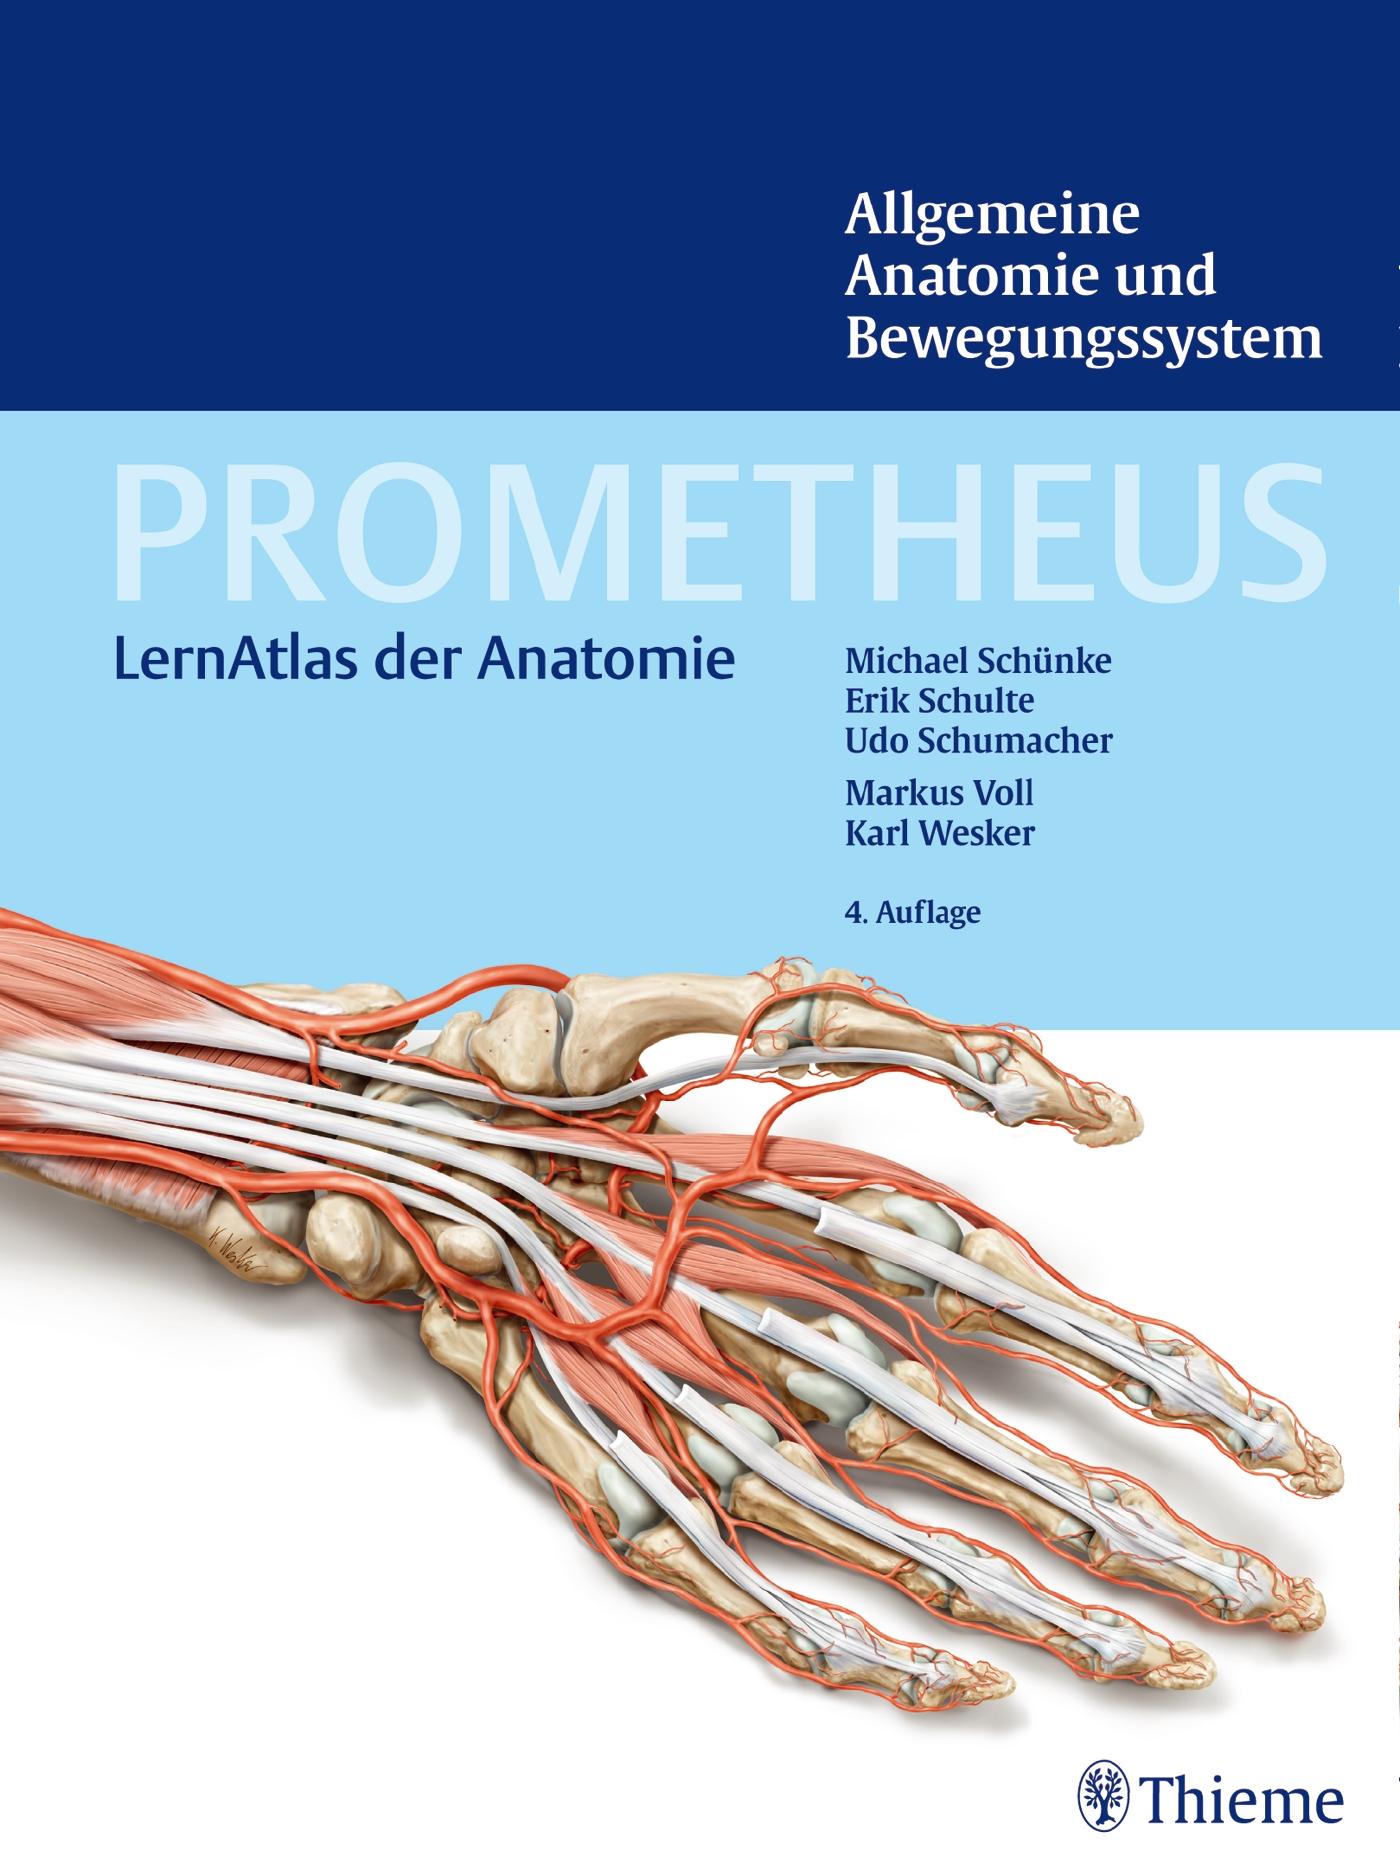 Kreuzmich Essen - Lernportal der Fachschaft Humanmedizin Essen